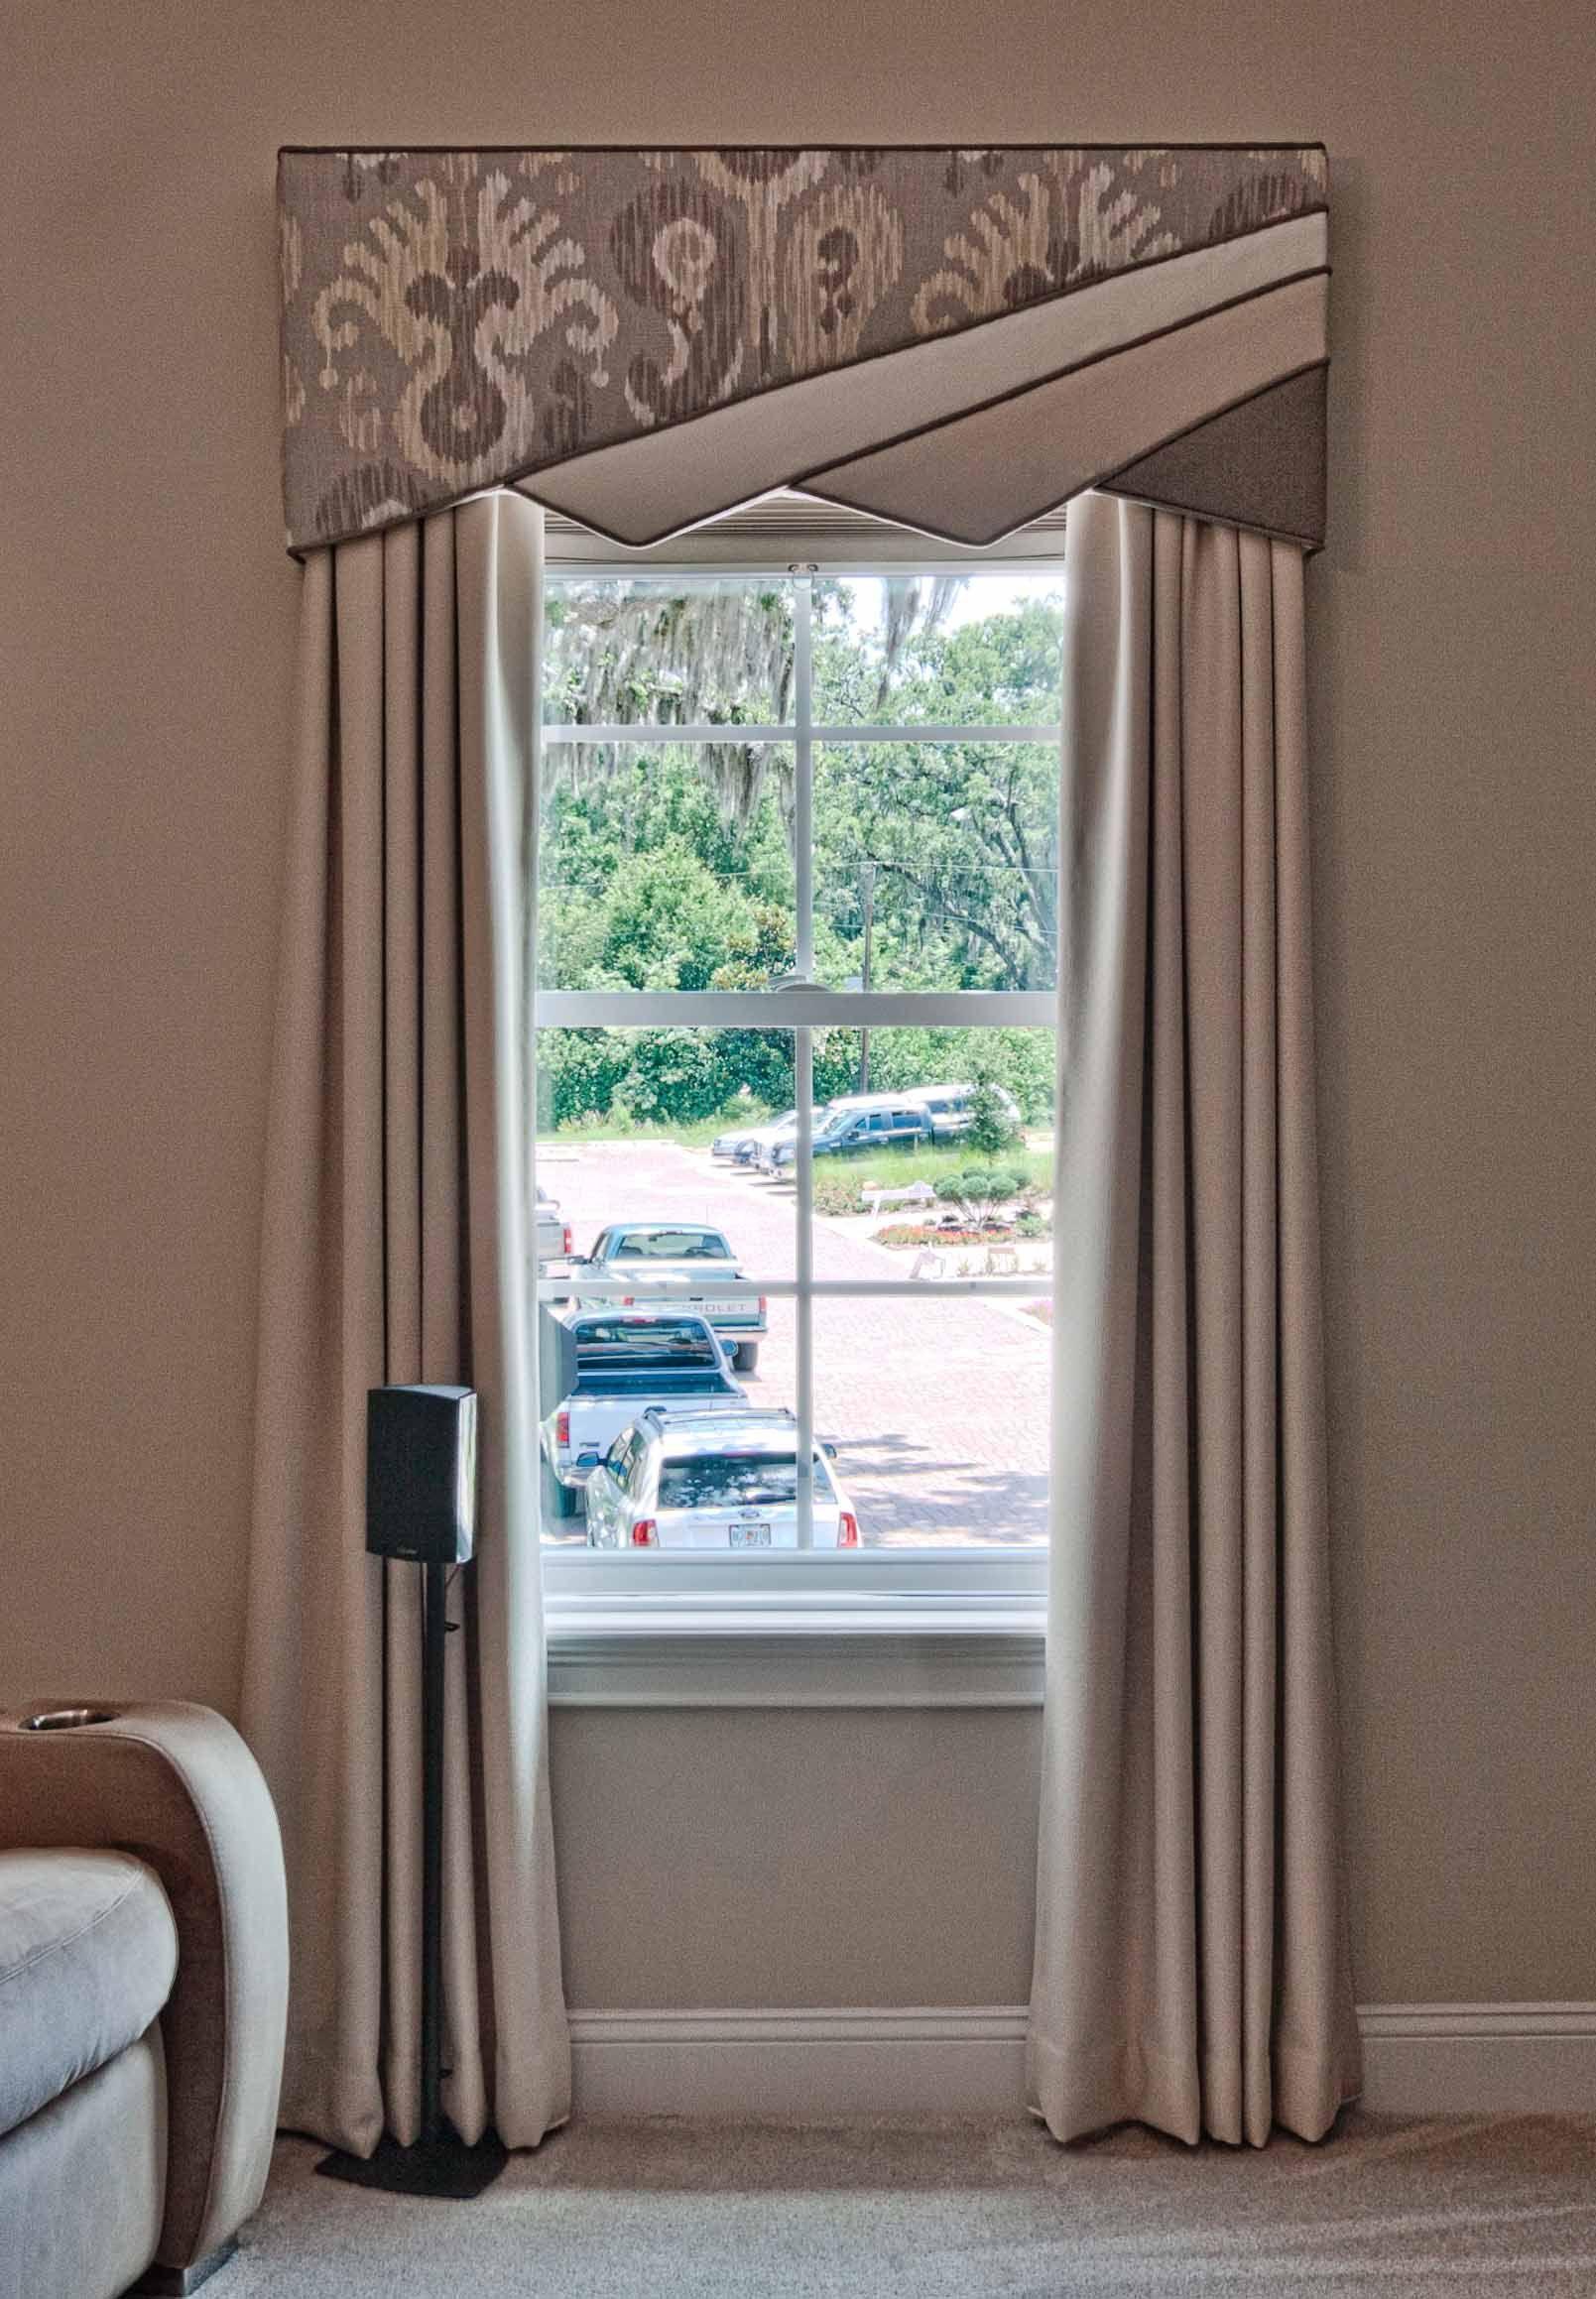 Window coverings ideas  contemporary window treatment design with a  split cornice design